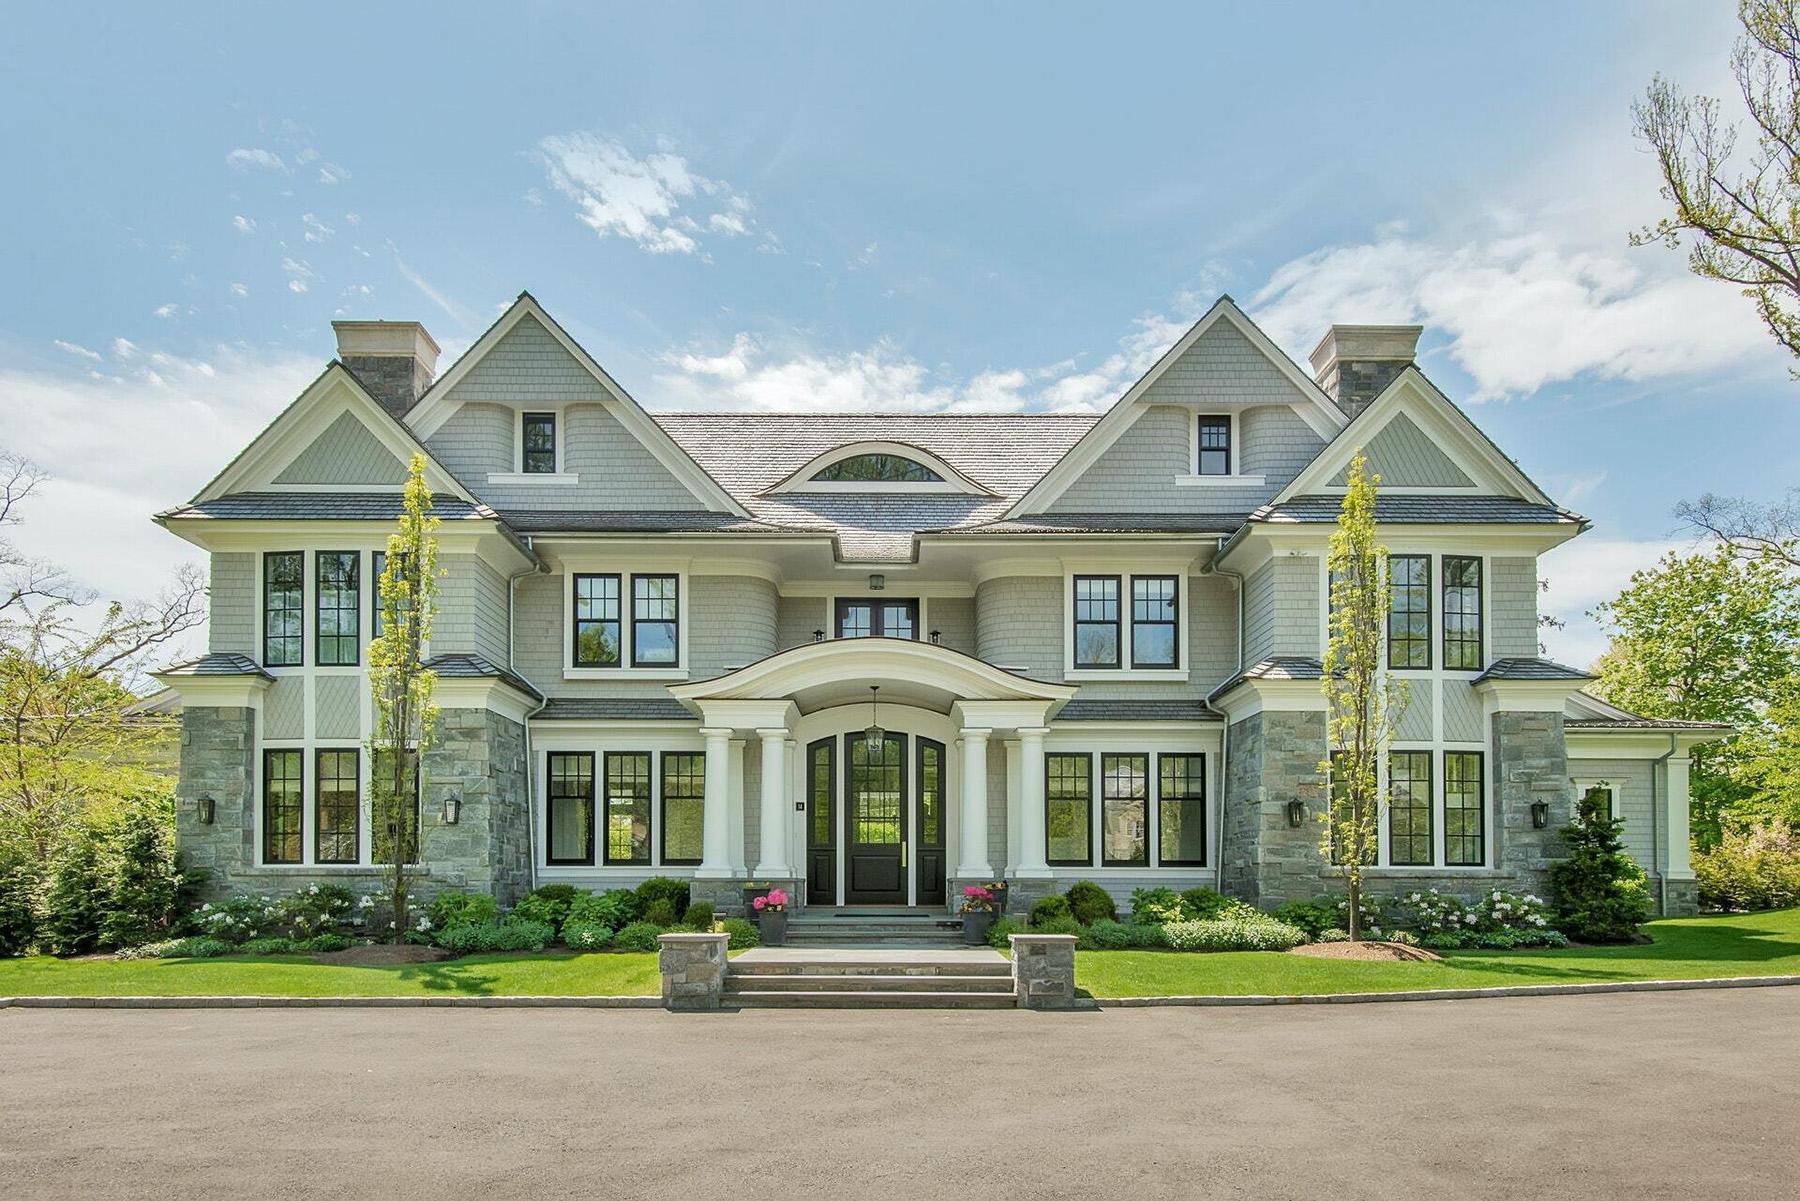 Stunning custom home with black windows, stone & gray siding.